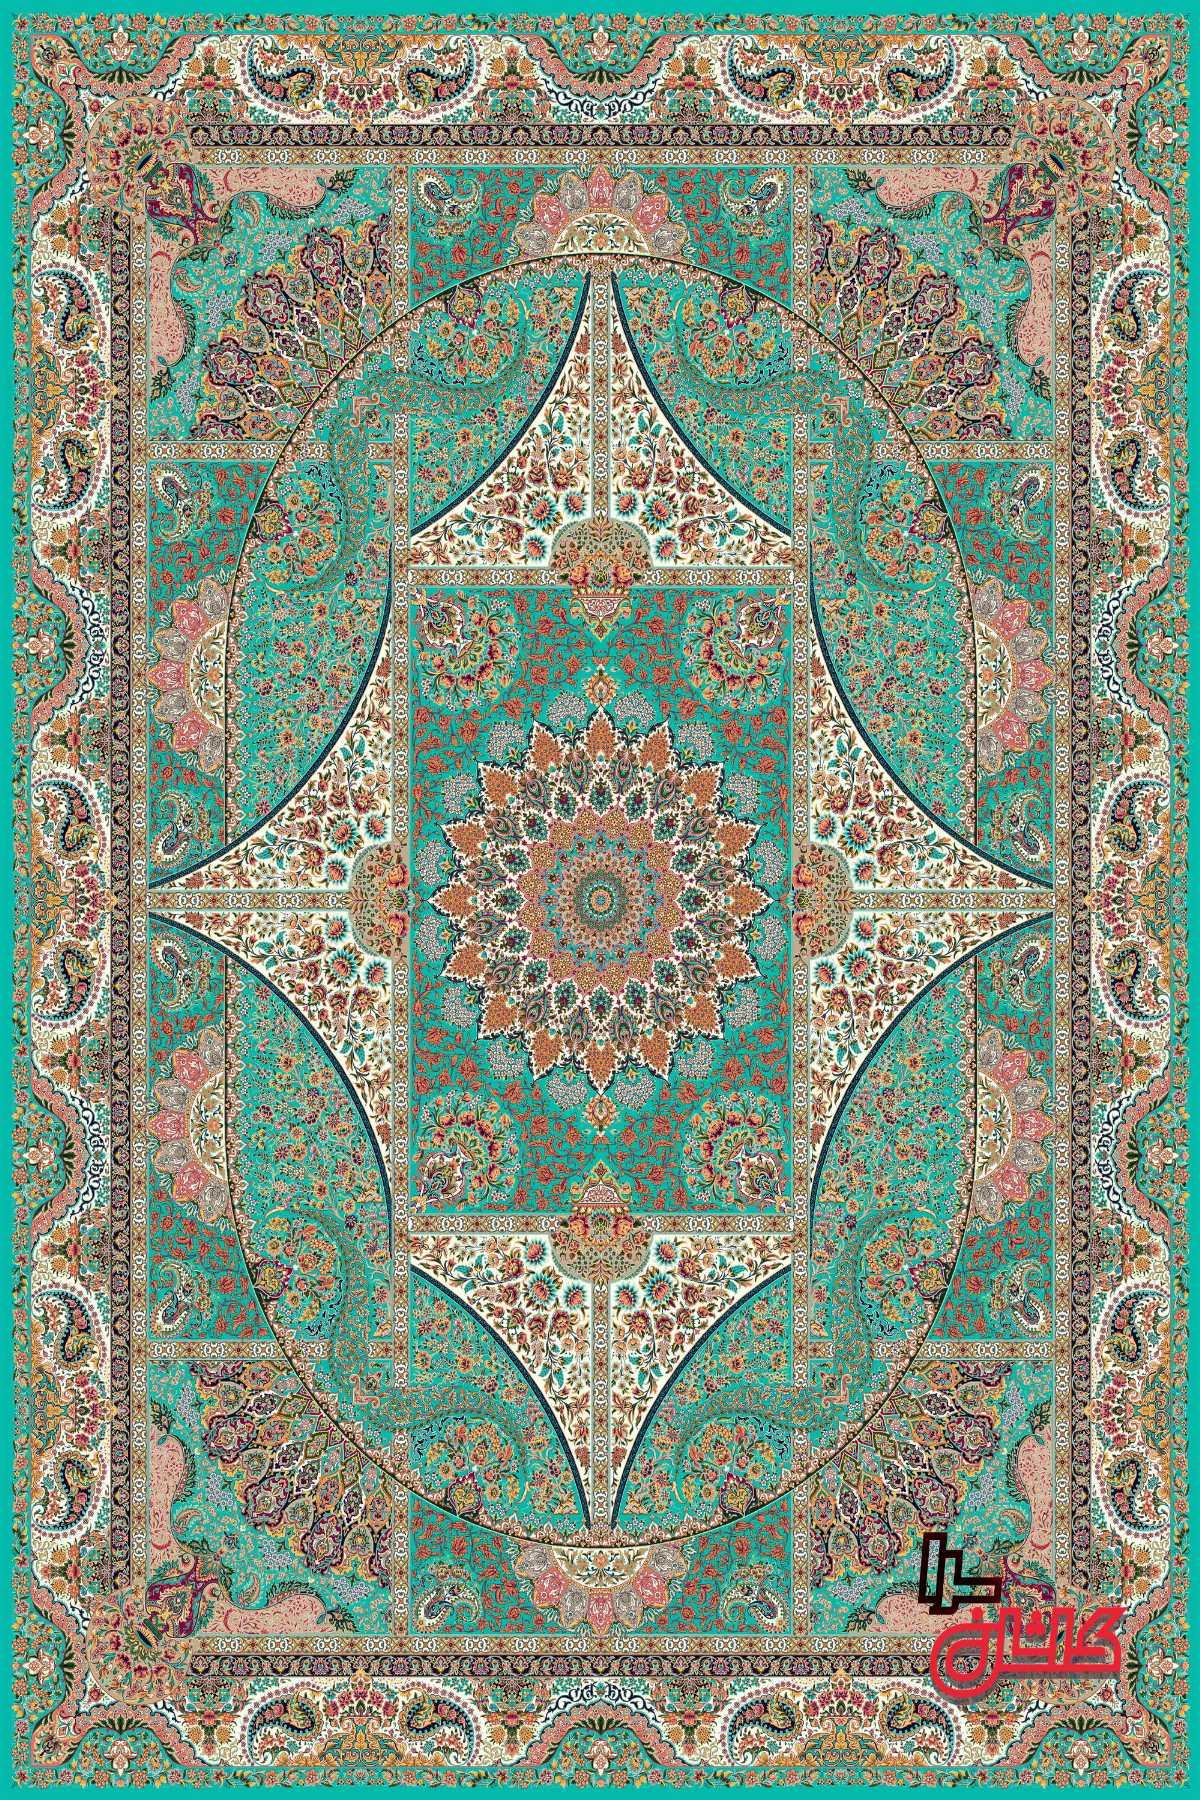 فرش ماشینی طرح خاص 1200 شانه تراکم 3600 کاشان